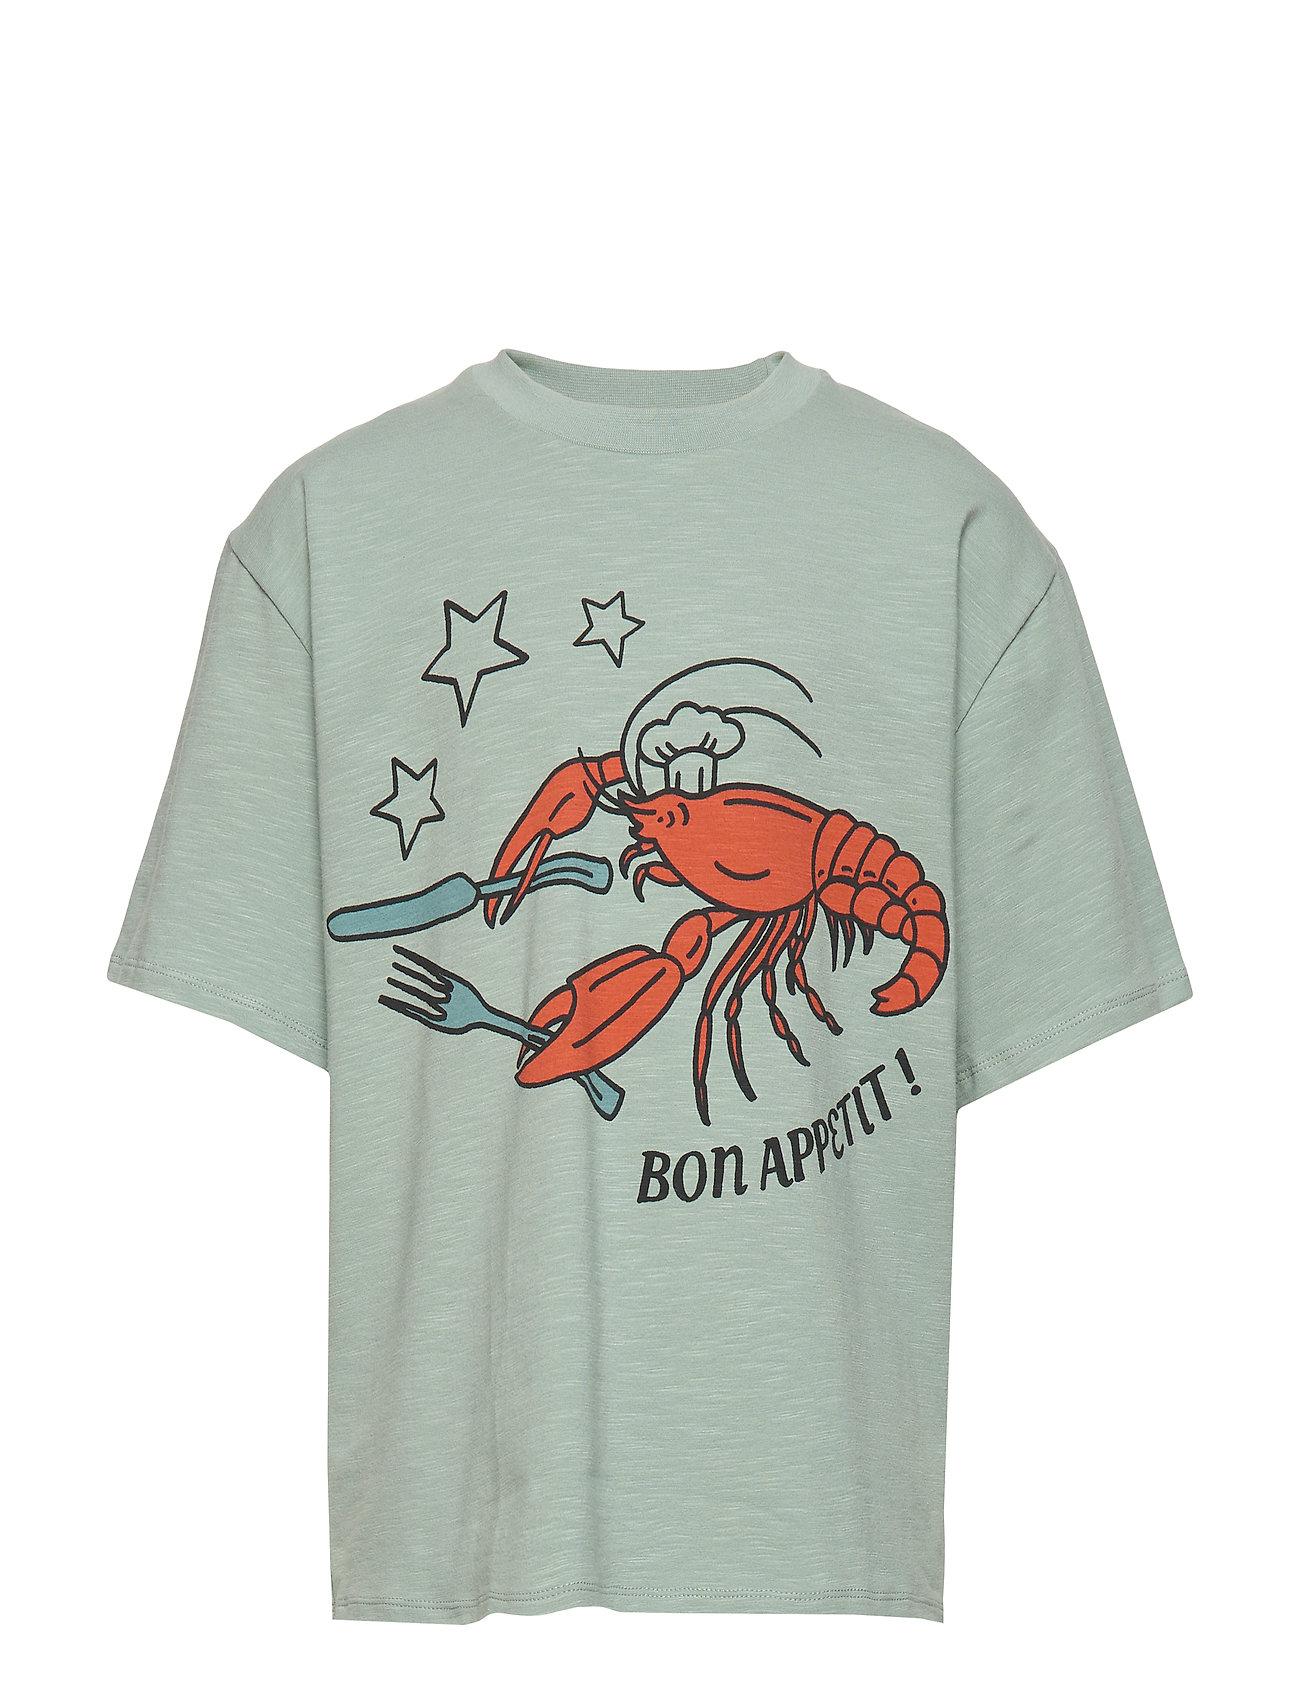 Soft Gallery Asger T-shirt - JADEITE, BON APPETIT